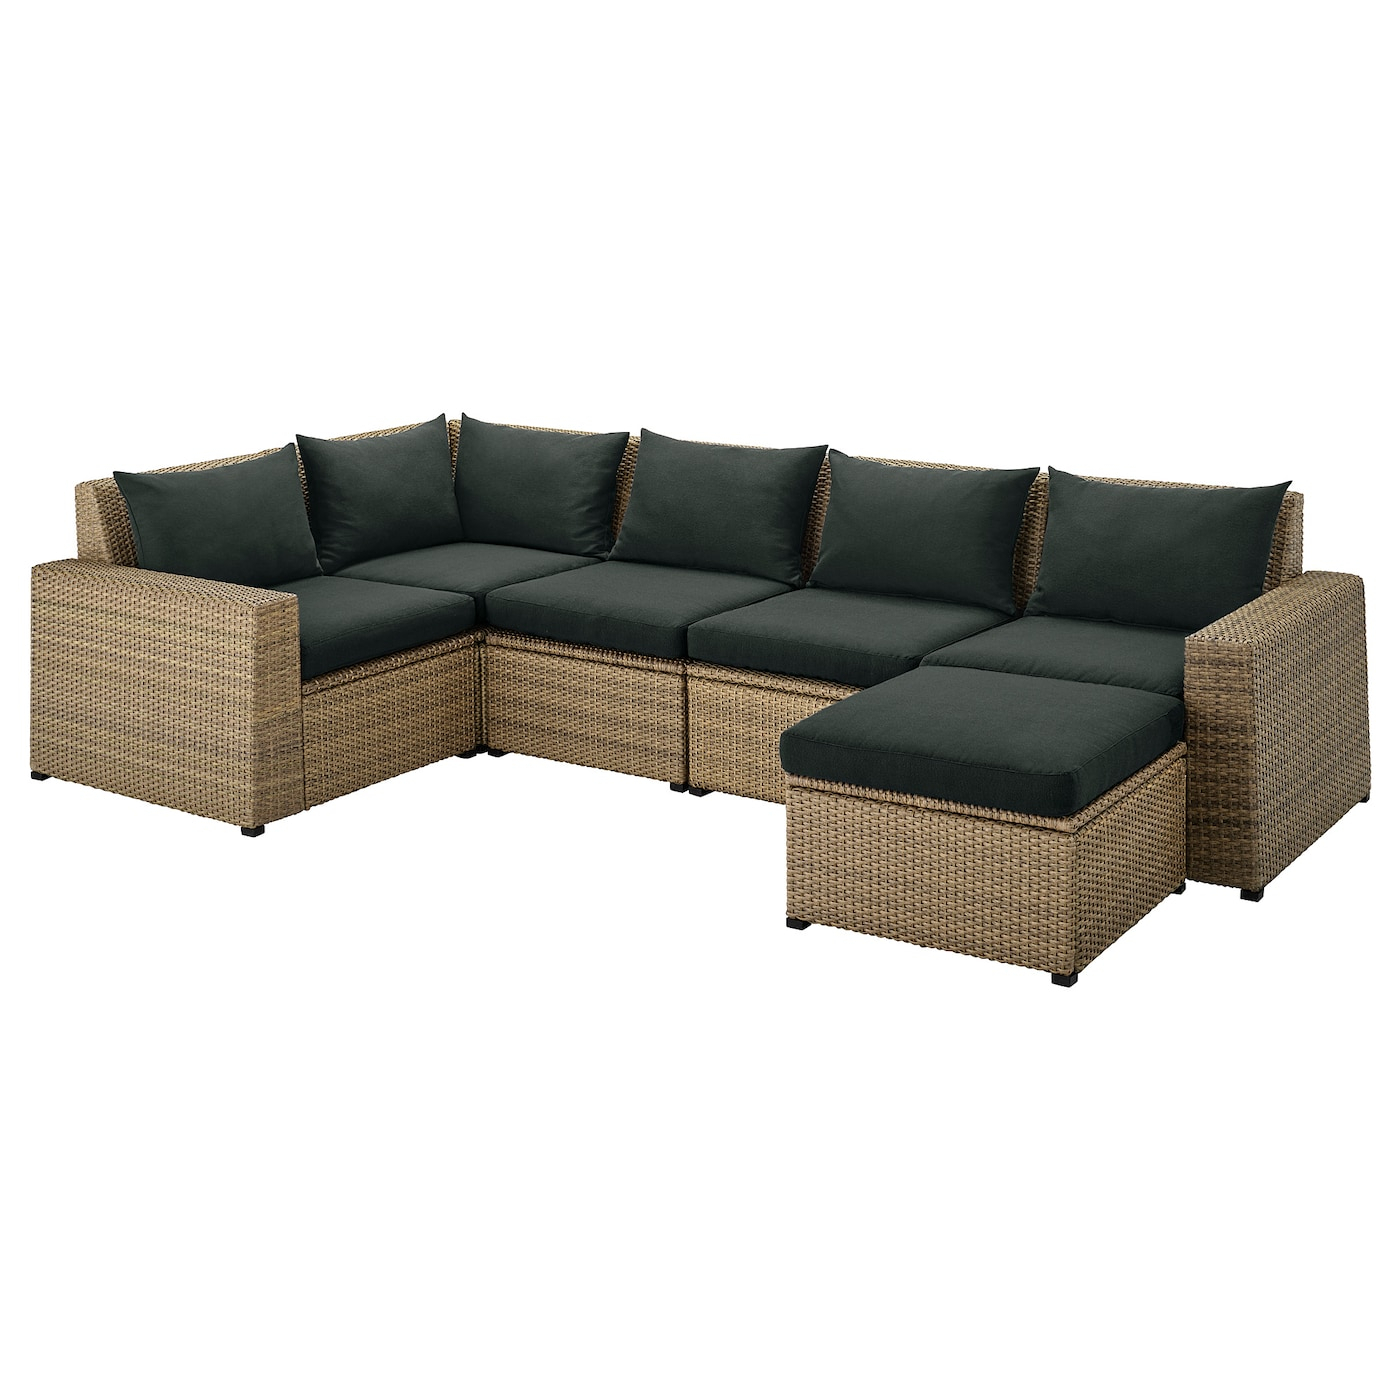 Sollerön Modular Corner Sofa 4 Seat, Outdoor – Brown With In Modular Corner Sofas (View 7 of 15)